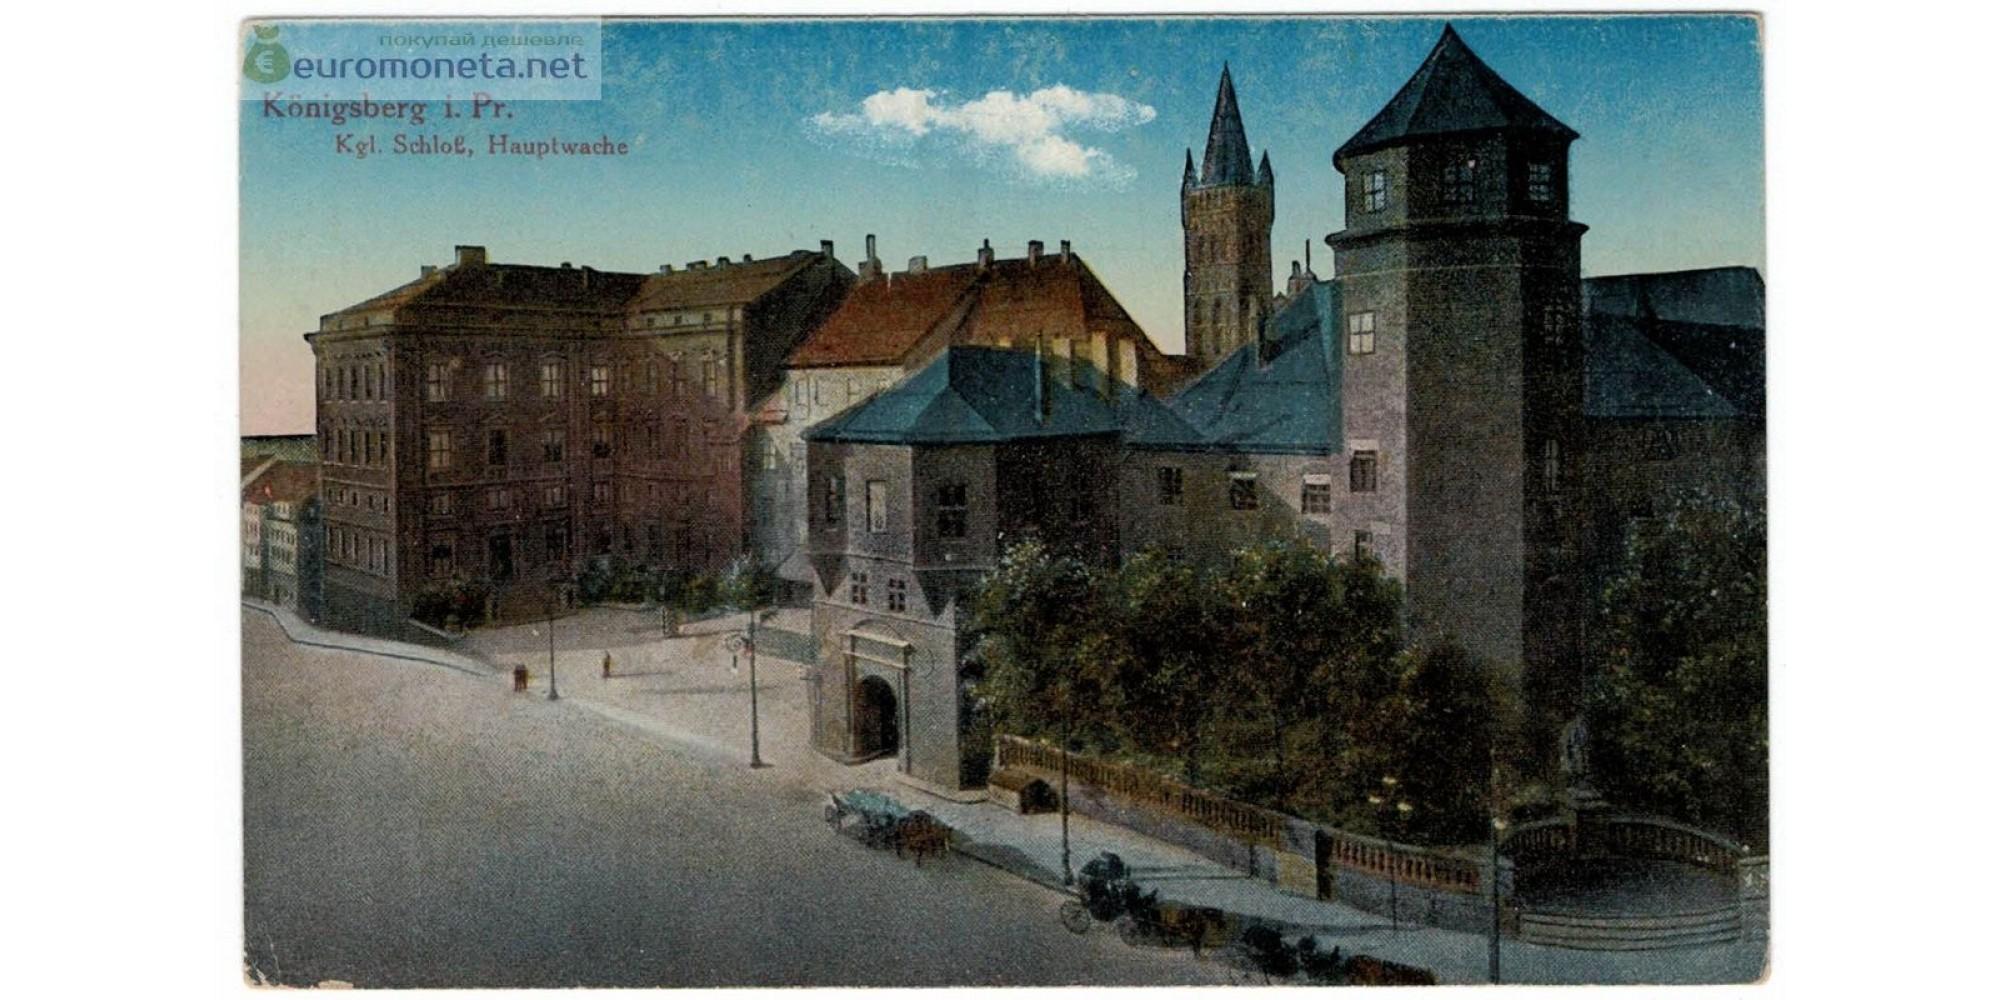 Открытка Пруссия Кёнигсберг Kenigsberg Королевский замок